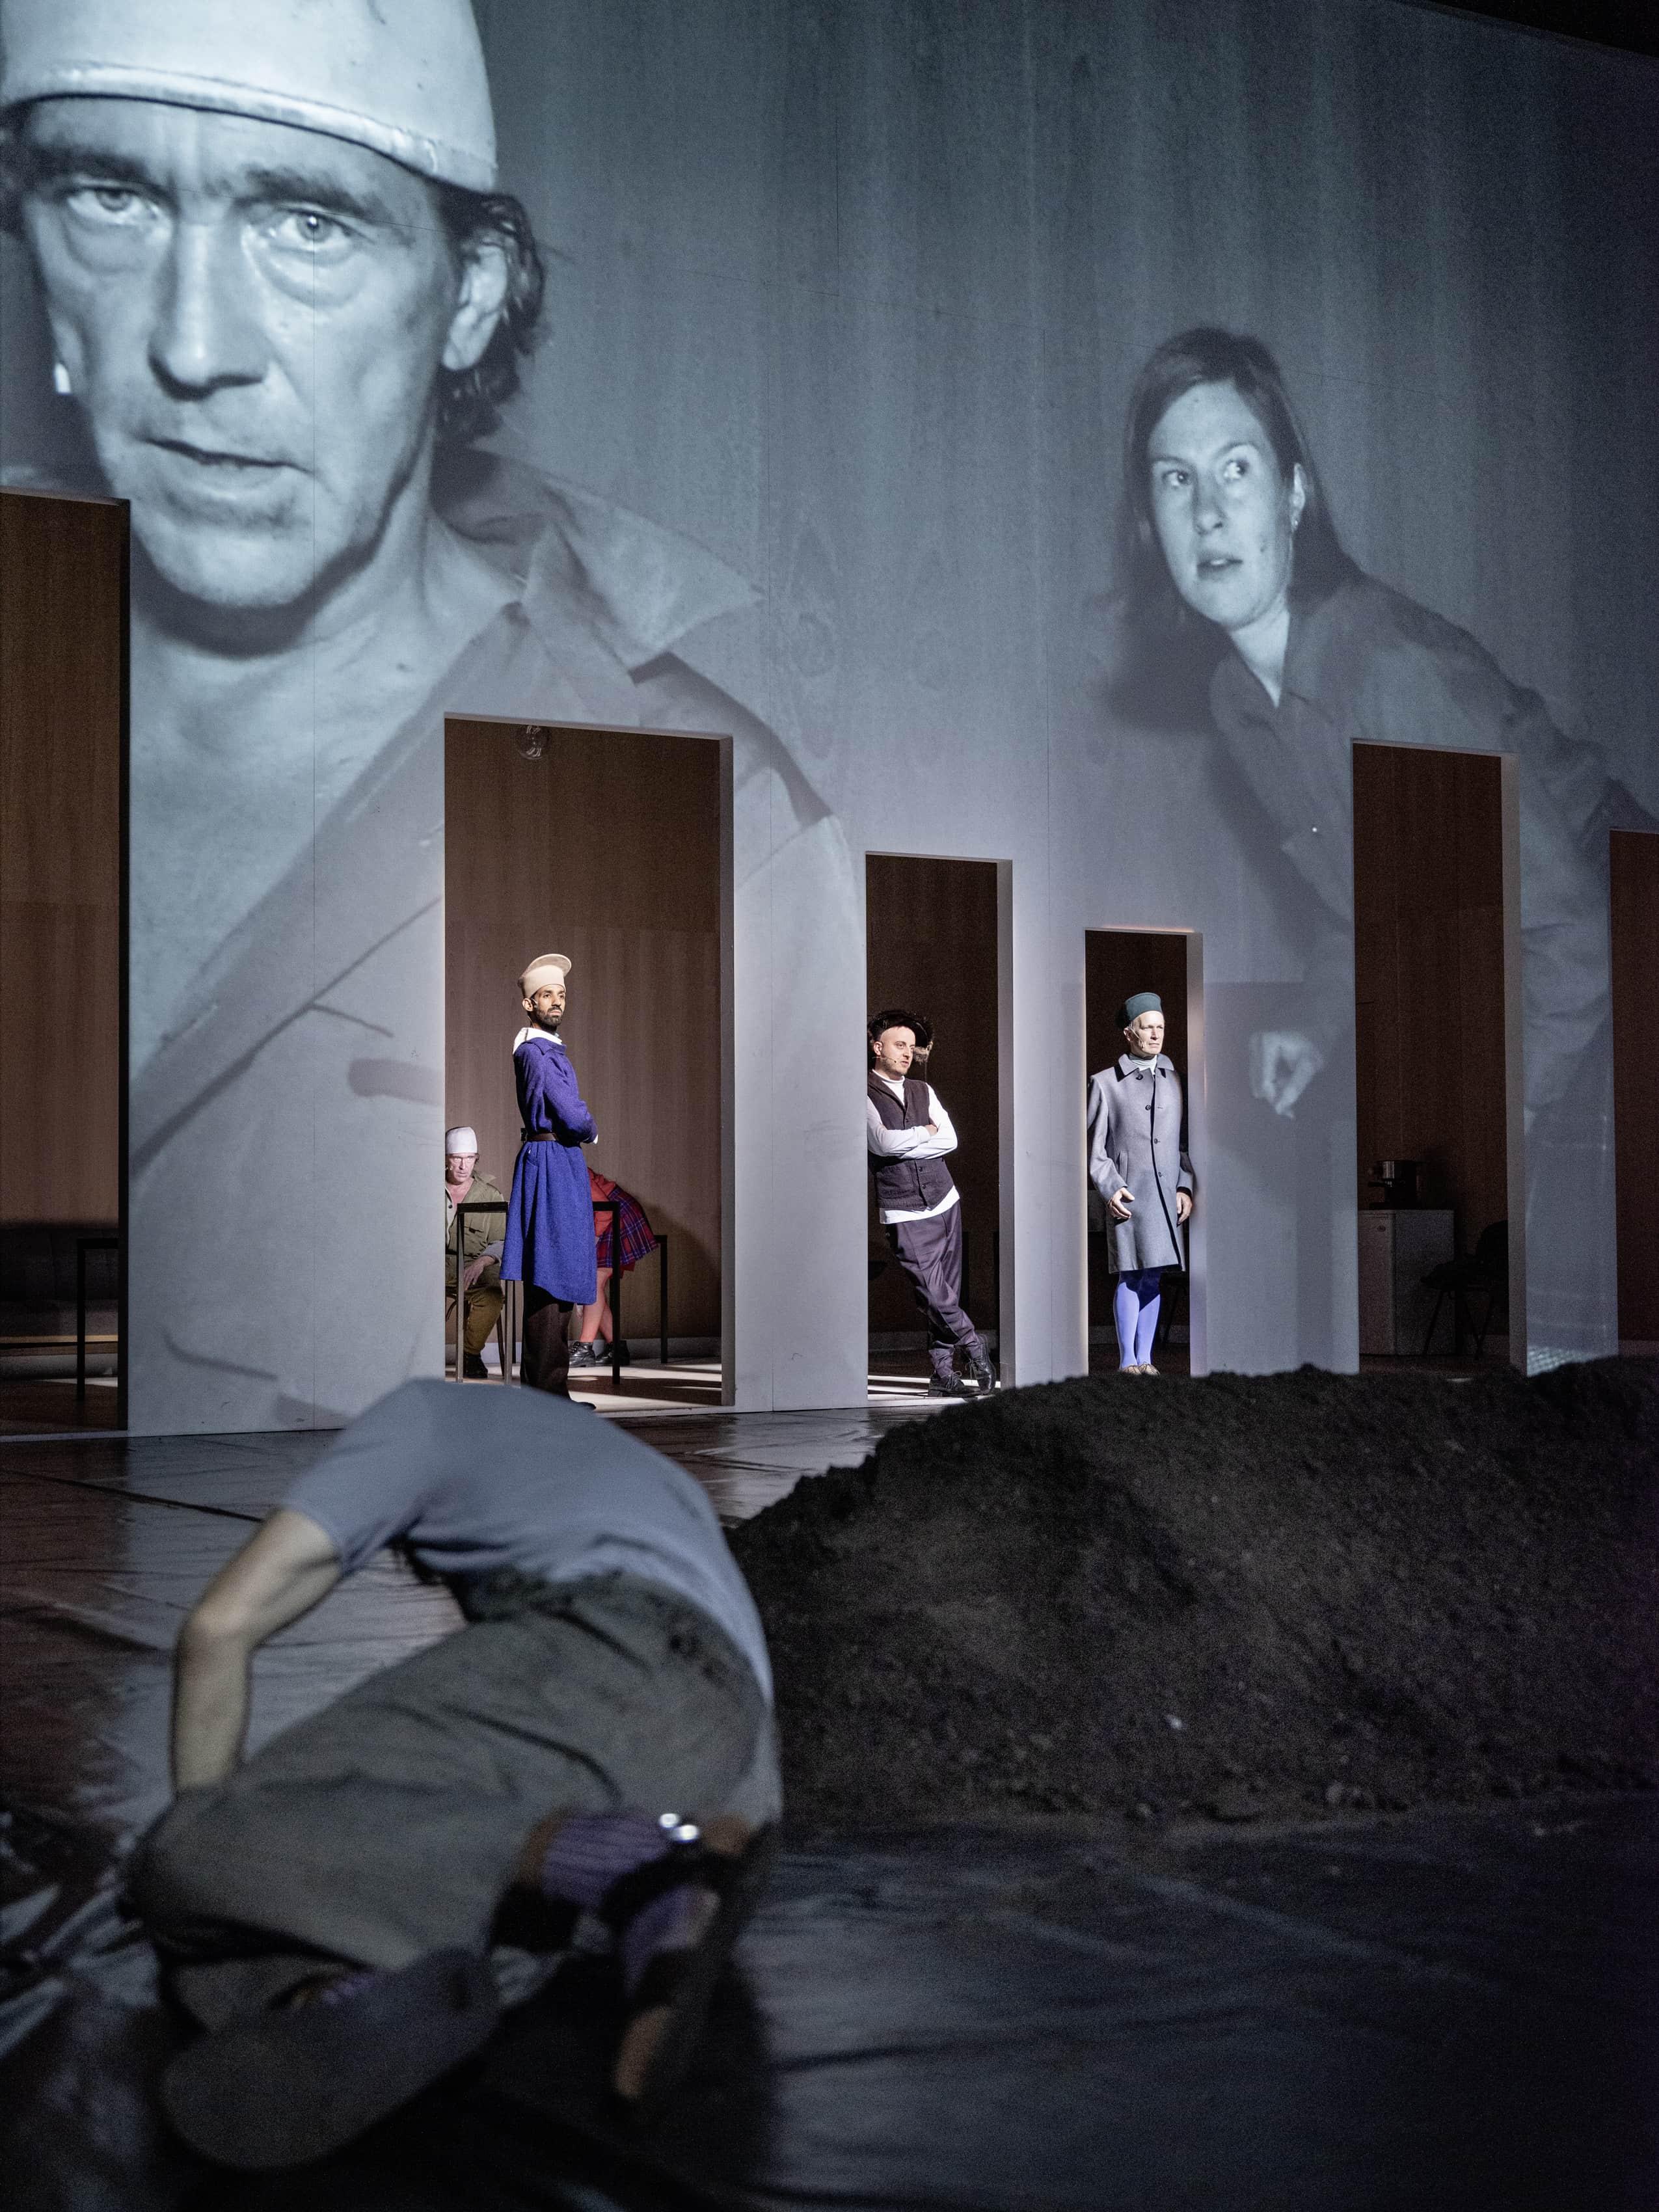 King Lear: Steven Scharf (vorn), Stefan Hunstein, Mourad Baaiz, Patrick Berg, Michael Lippold (v. li.) © JU Bochum